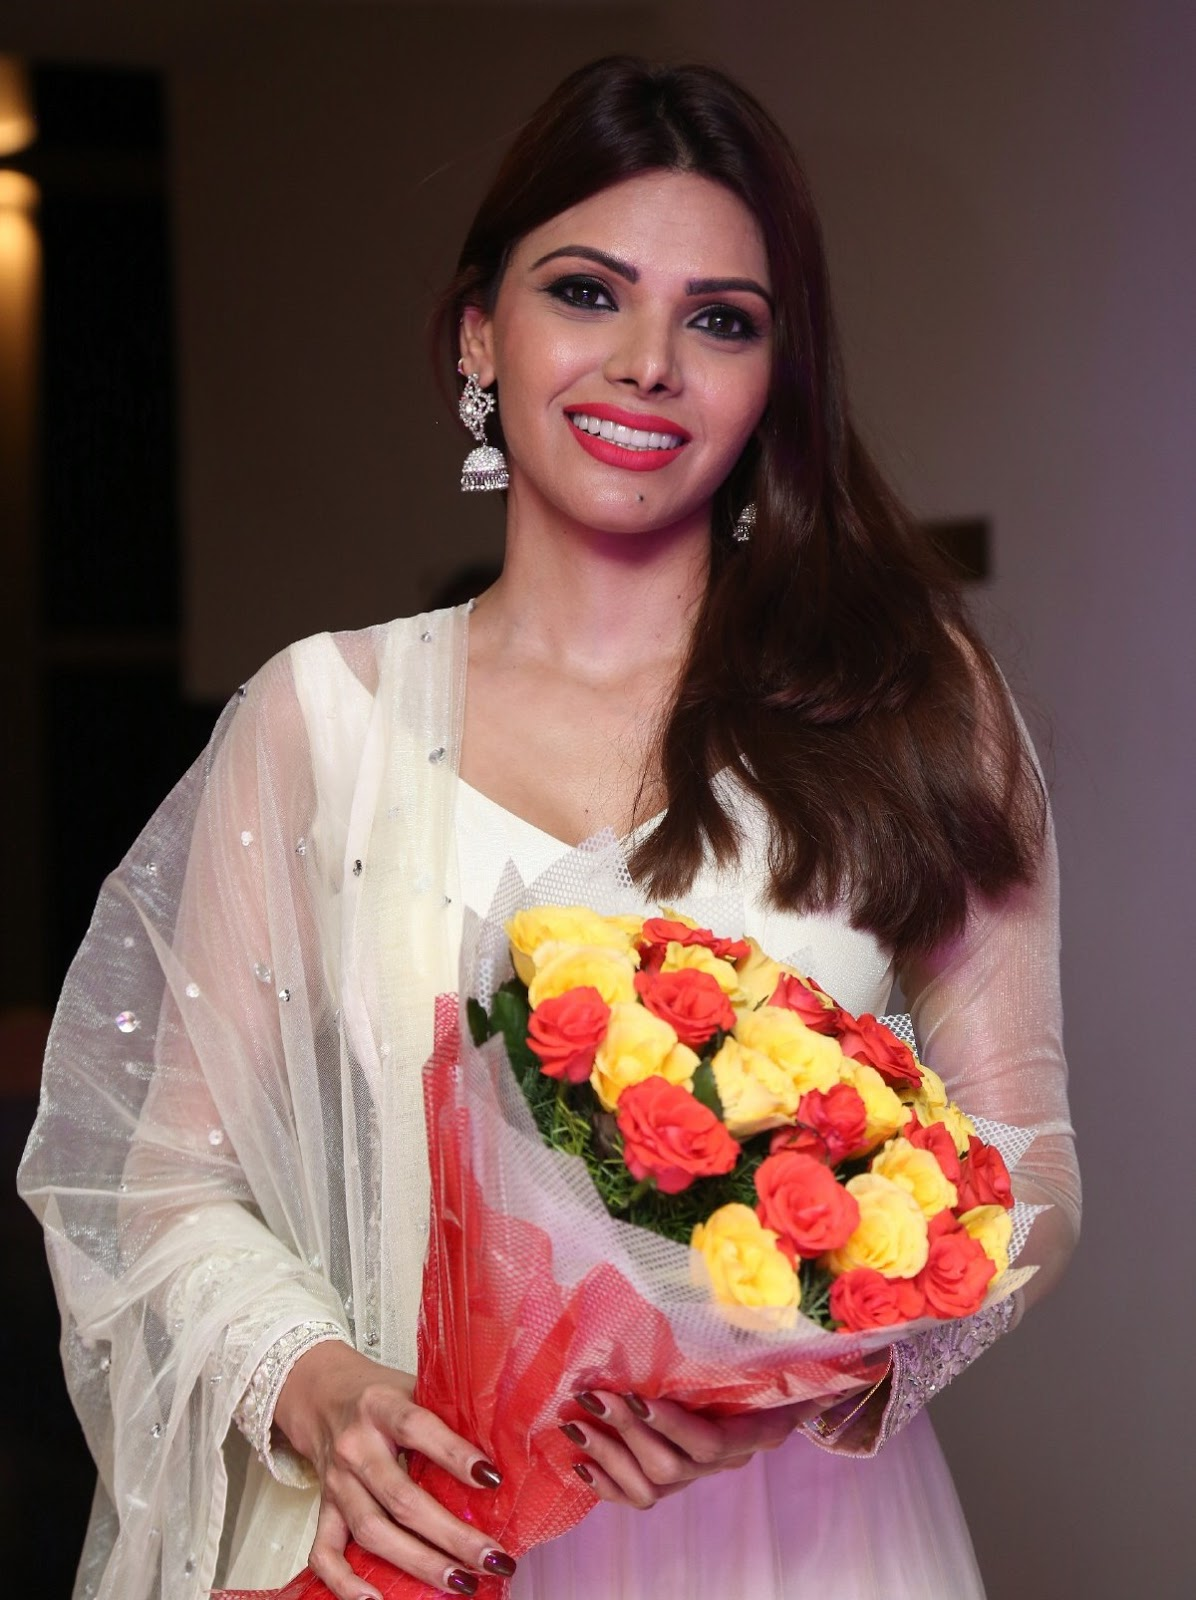 Sherlyn Chopra Looks Super Hot In White Dress At Dj Inayah -4614